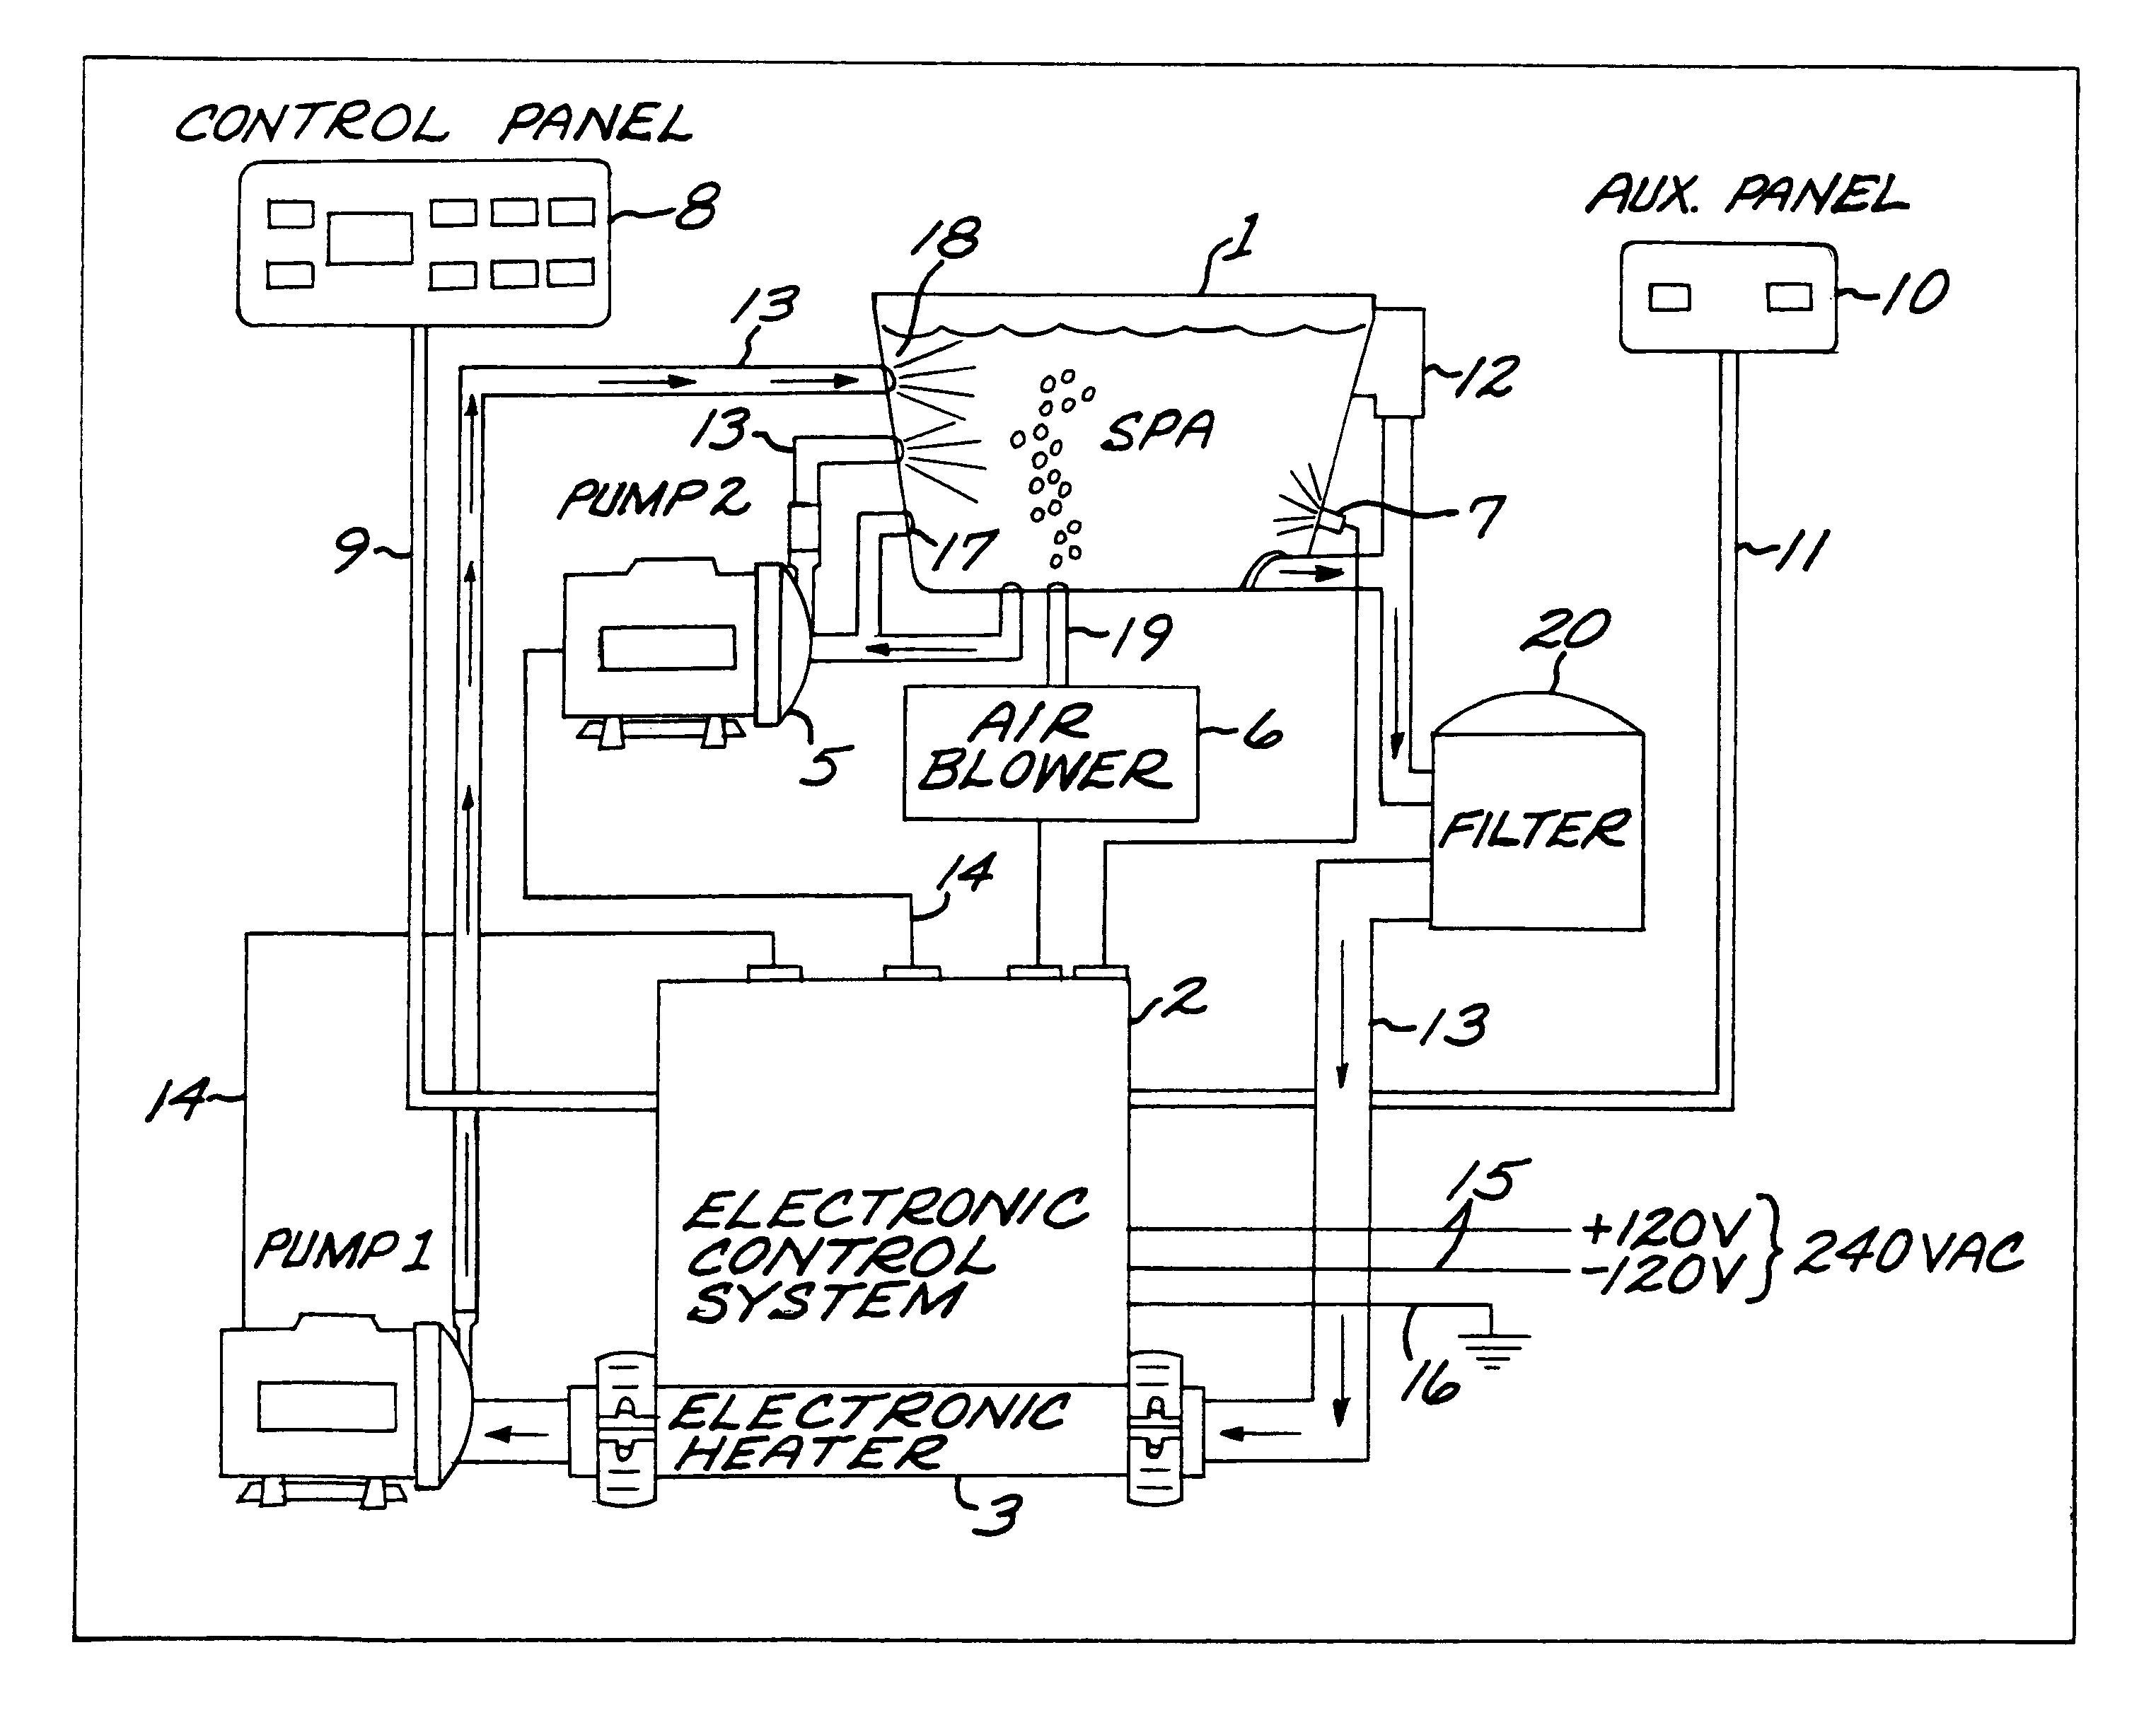 balboa instruments wiring diagram greddy wiring harness